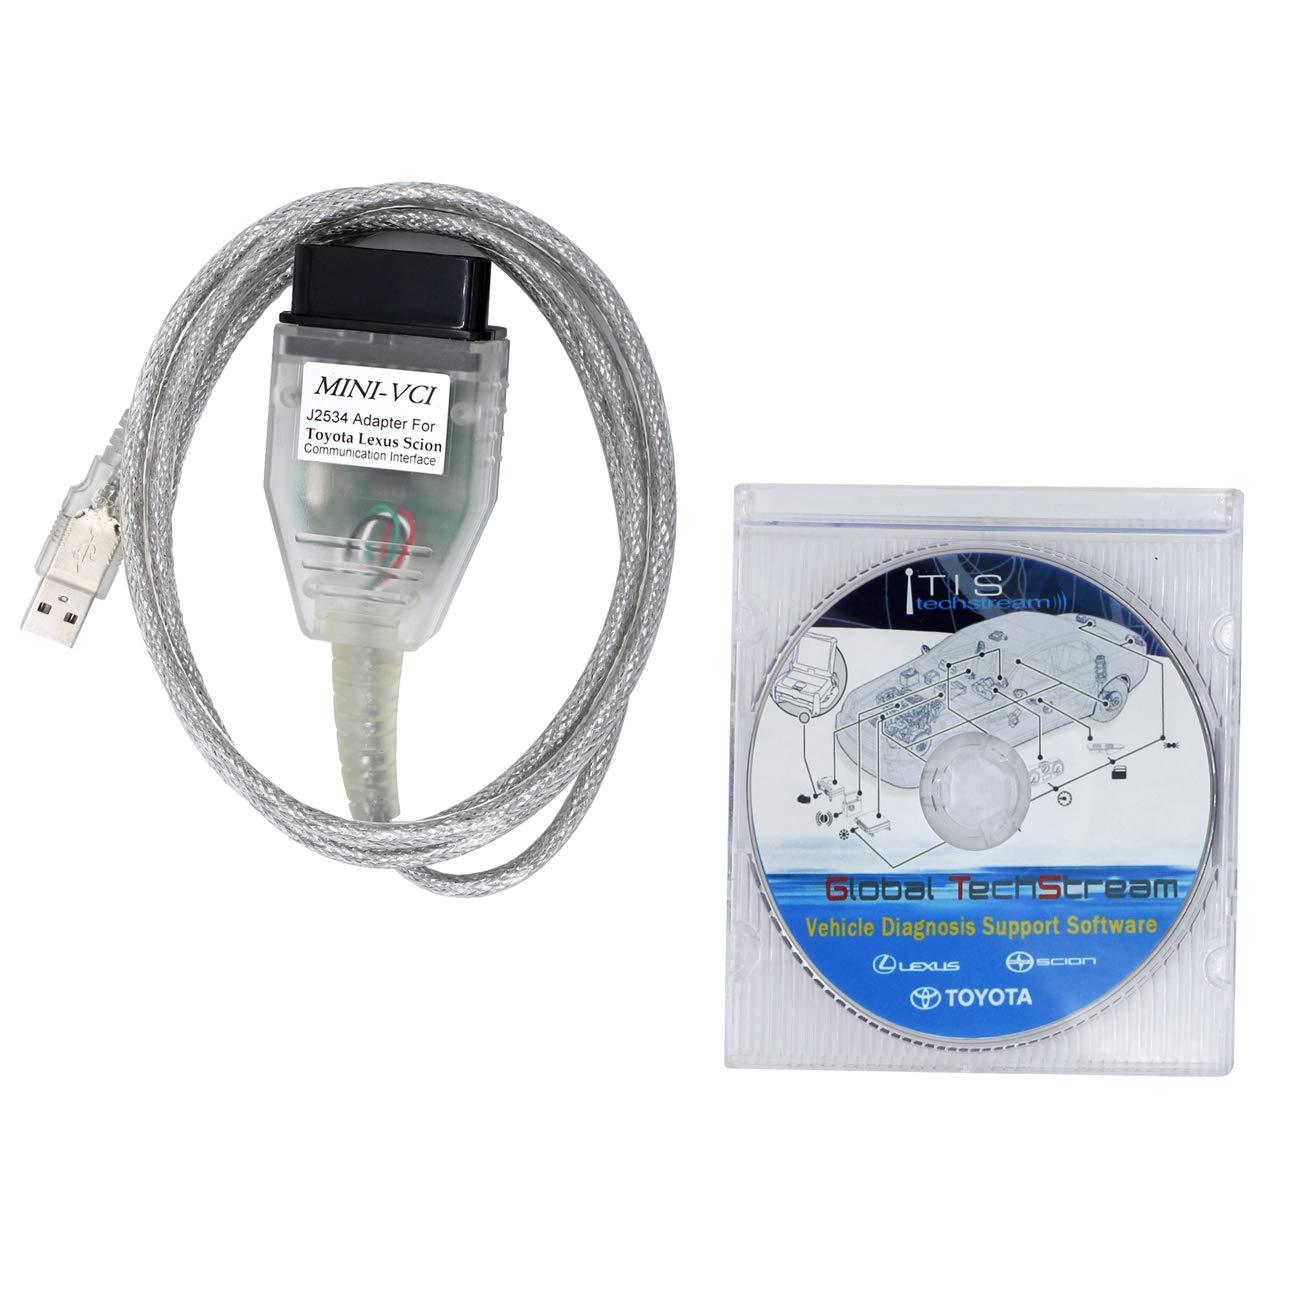 SZ-TONDA Mini VCI Techstream J2534 Cable - V2.0.4 Firmware and V14.10.028 Software TIS Techstream OBD2 K+CAN Code Reader 64bit Scanner Mini-VCI Diagnostic Tool for Lexus Toyota Scion